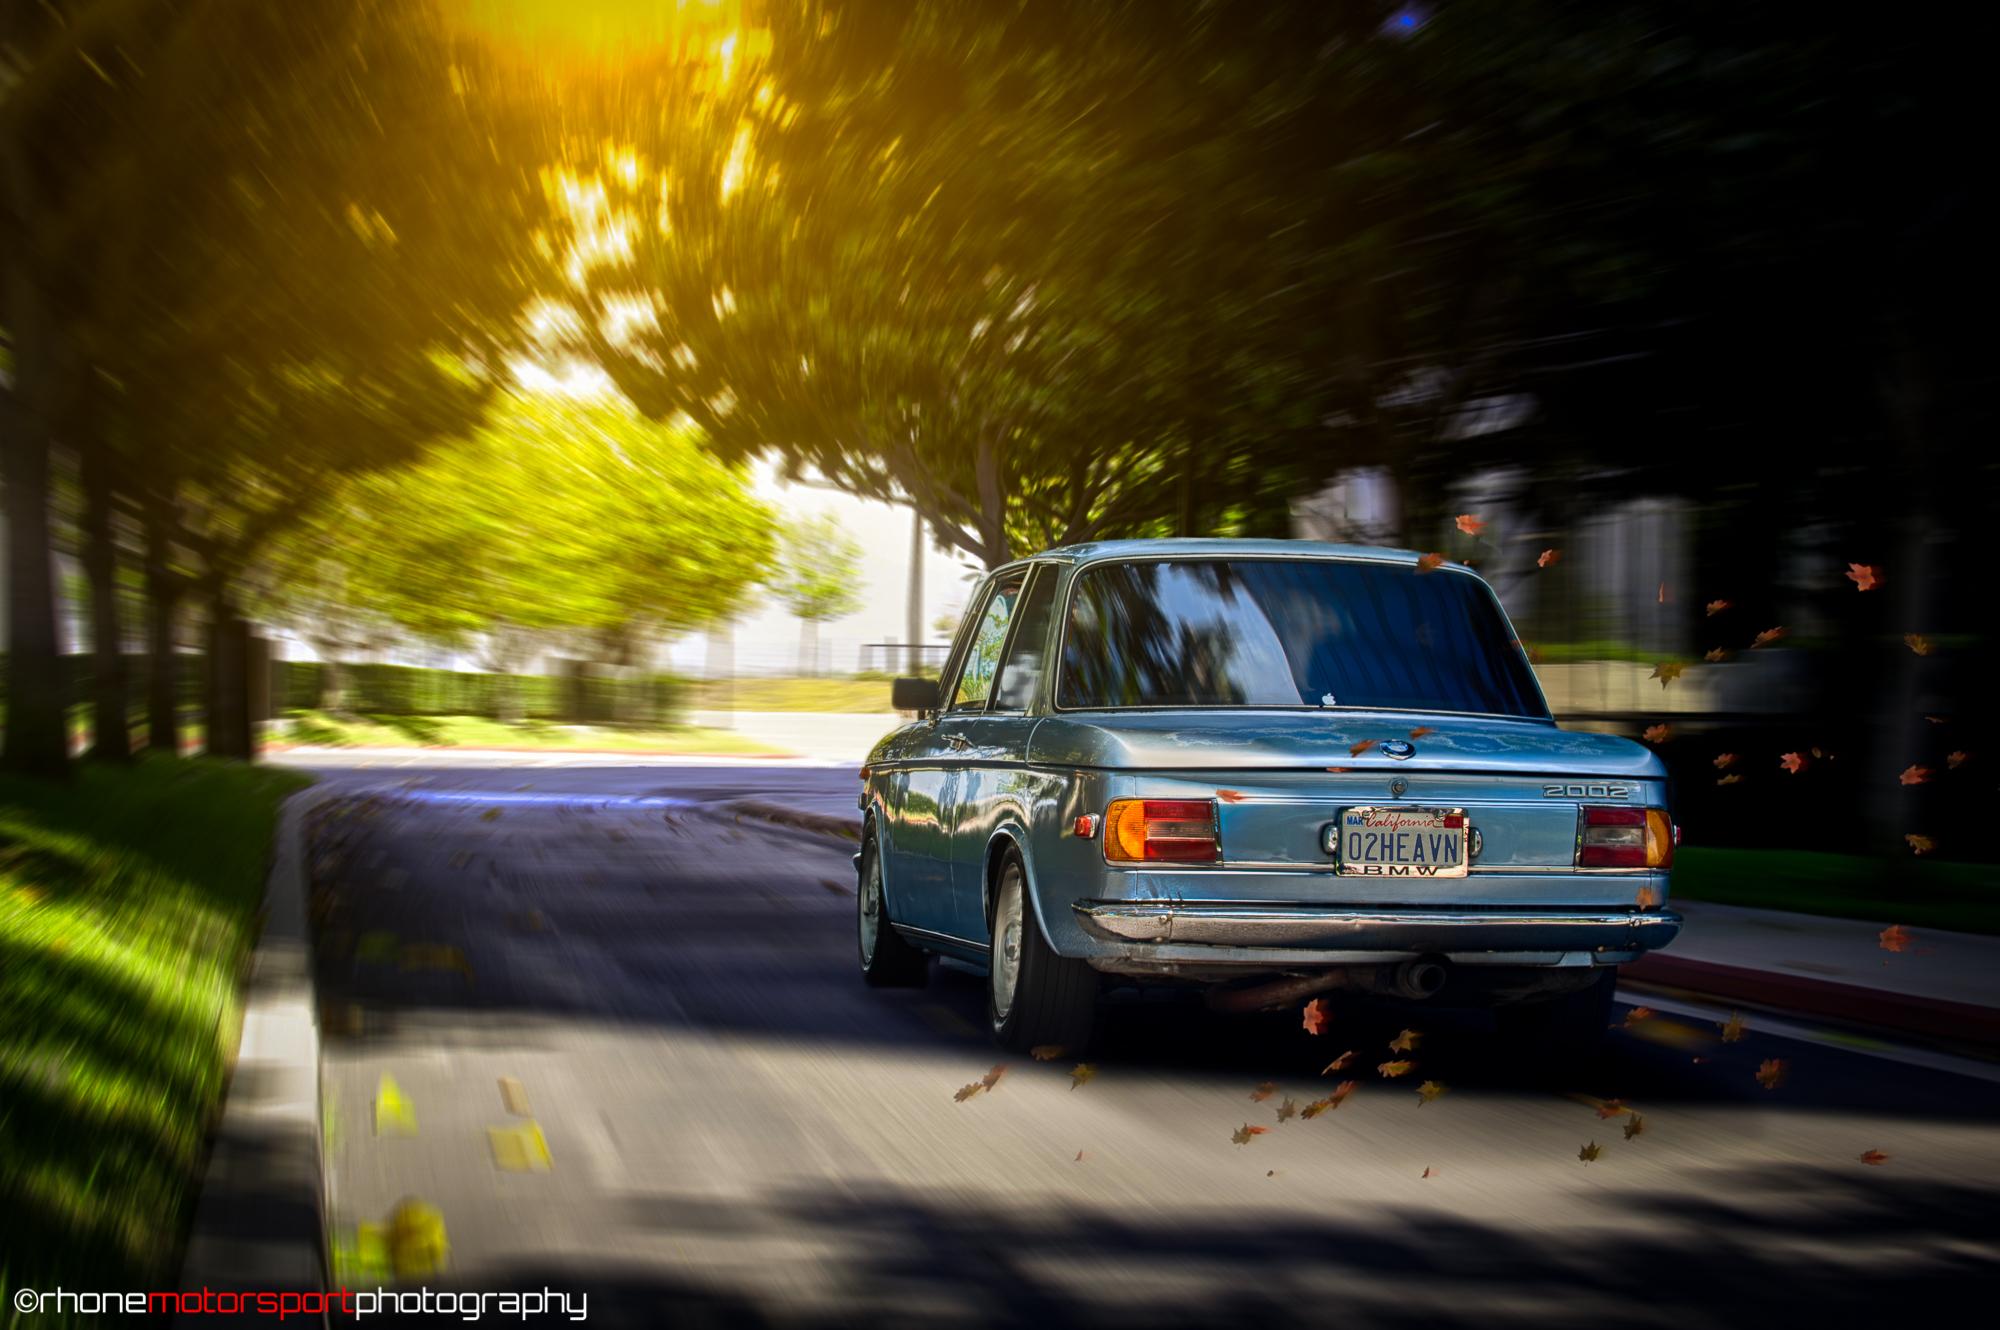 rhone motorsport photography, nikon d700, john rhone, fjord, vintage, bmw 2002, classic, virtualrig